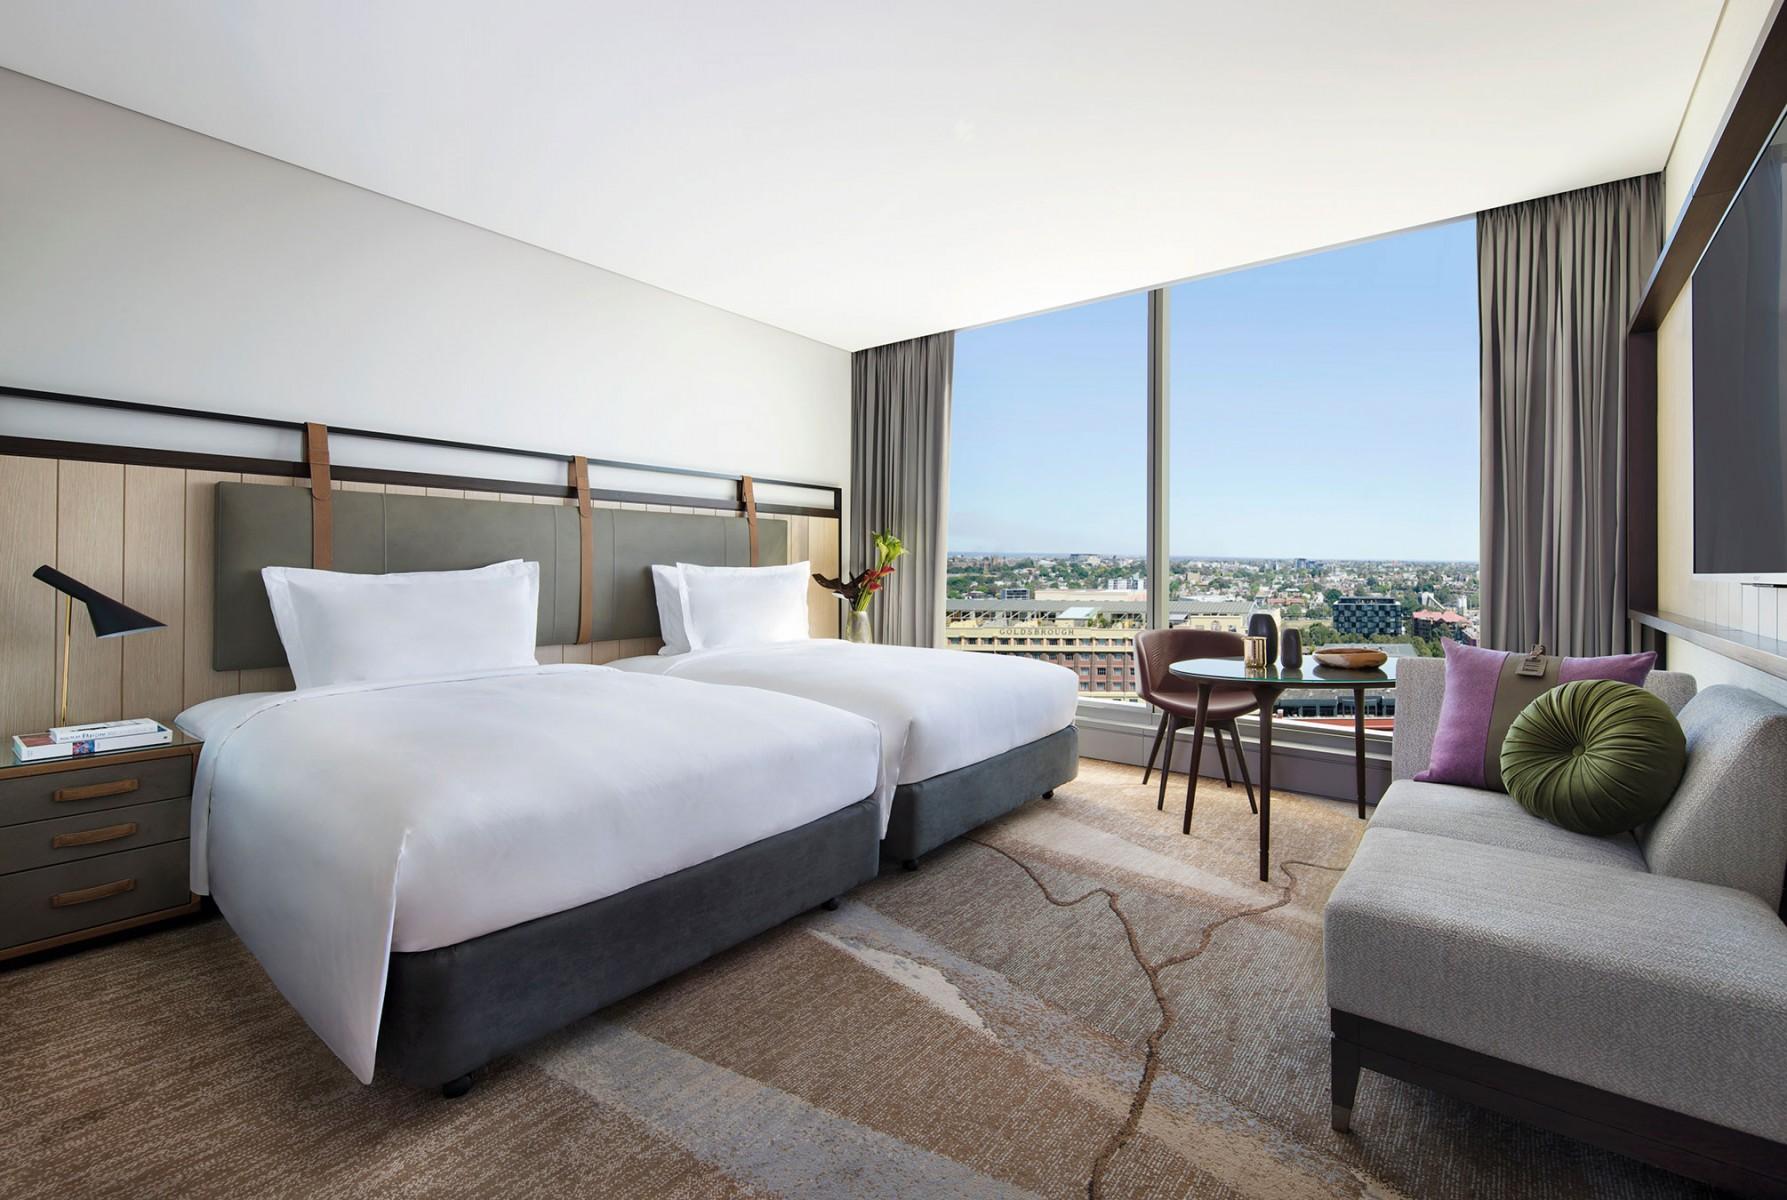 Image result for Elegant Hotel Accommodation sydney